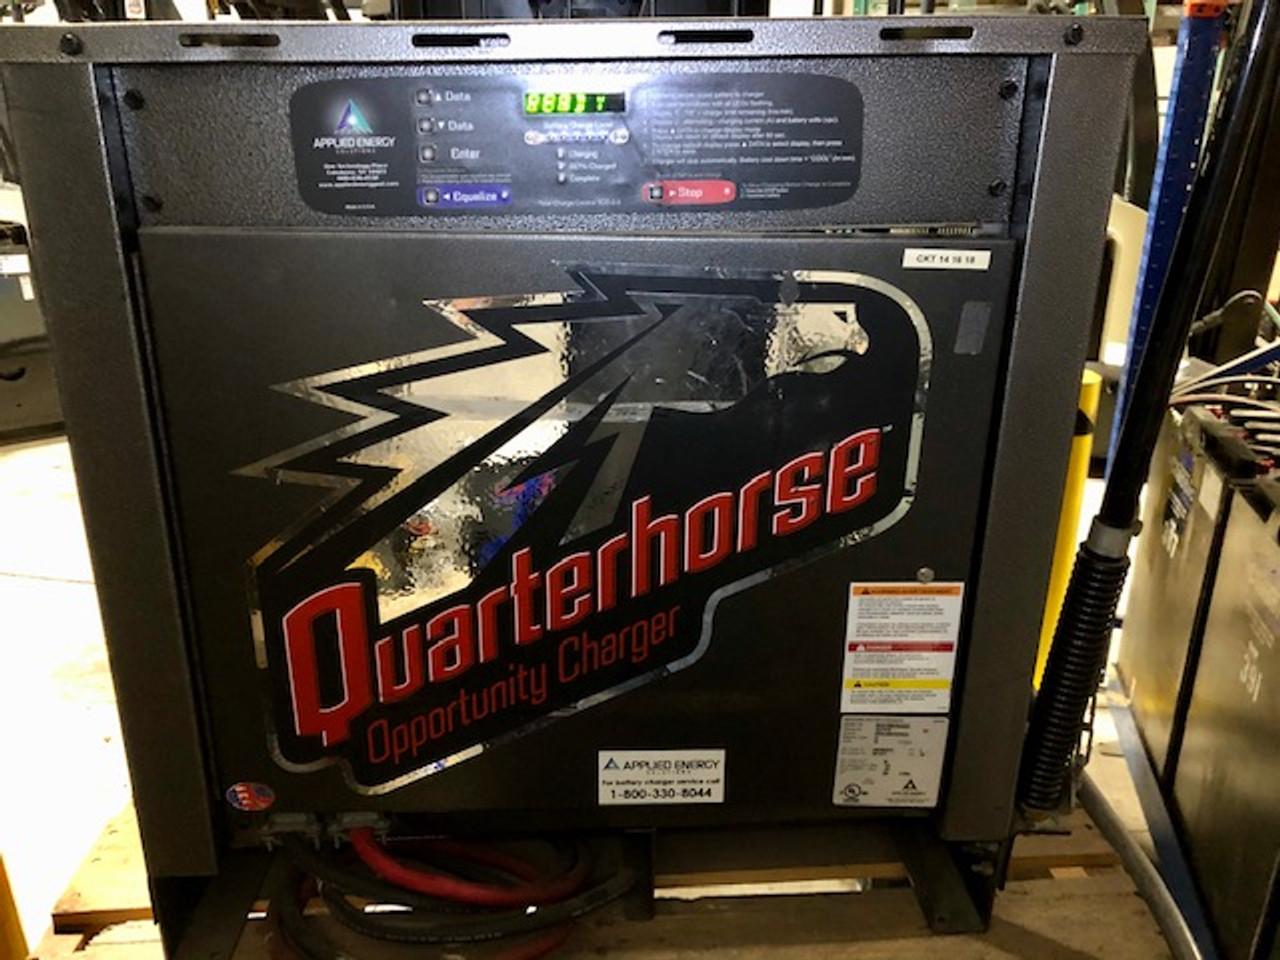 36 Volt Quarter Horse Opportunity Smart Charger 750 Amp Hour 3 Phase 240/480/575 Volts Input